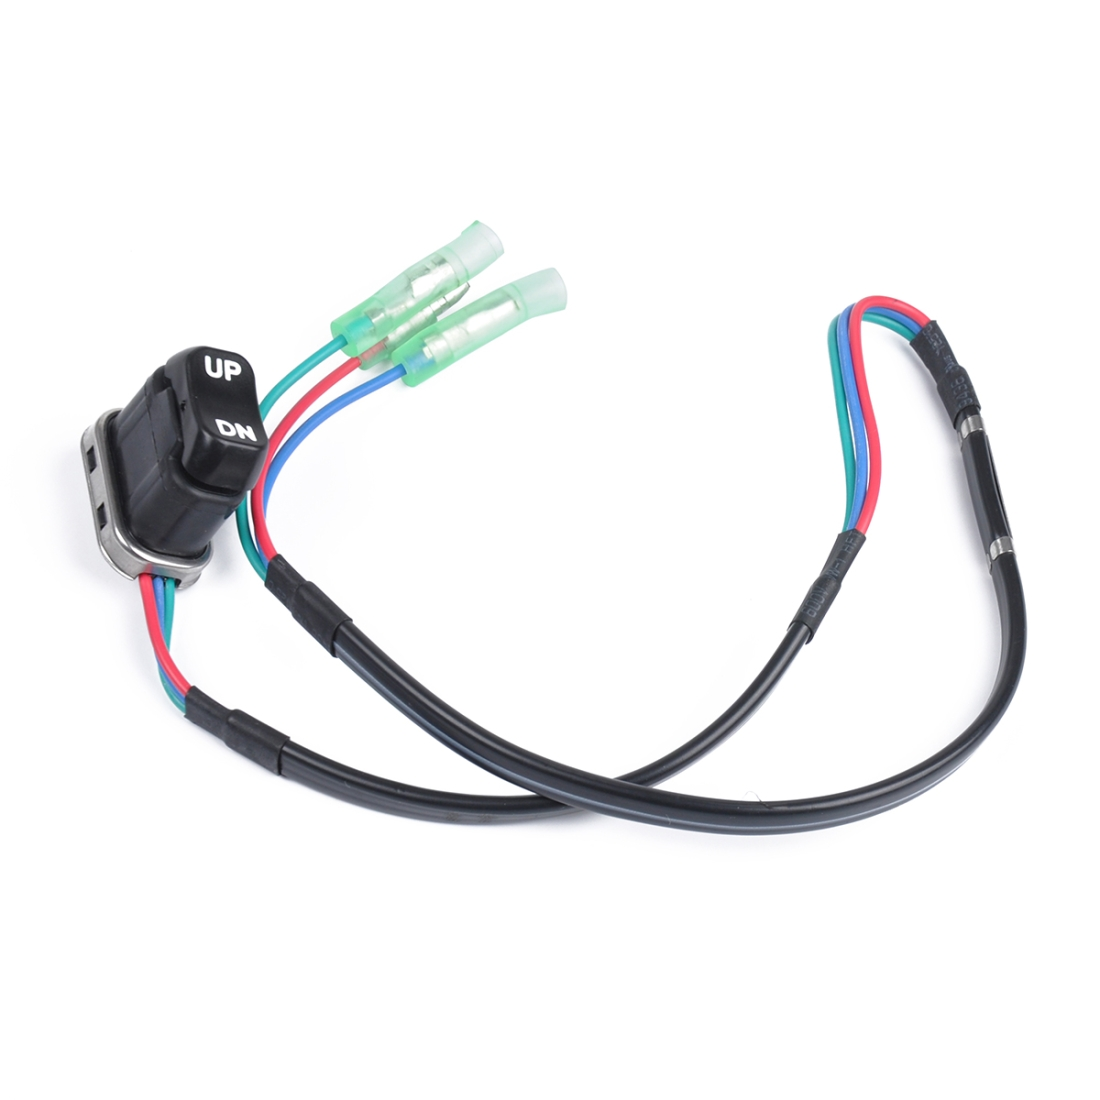 TRIM /& TILT Switch A 703-82563-02-00 703-82563-01 for Yamaha Outboard Motors